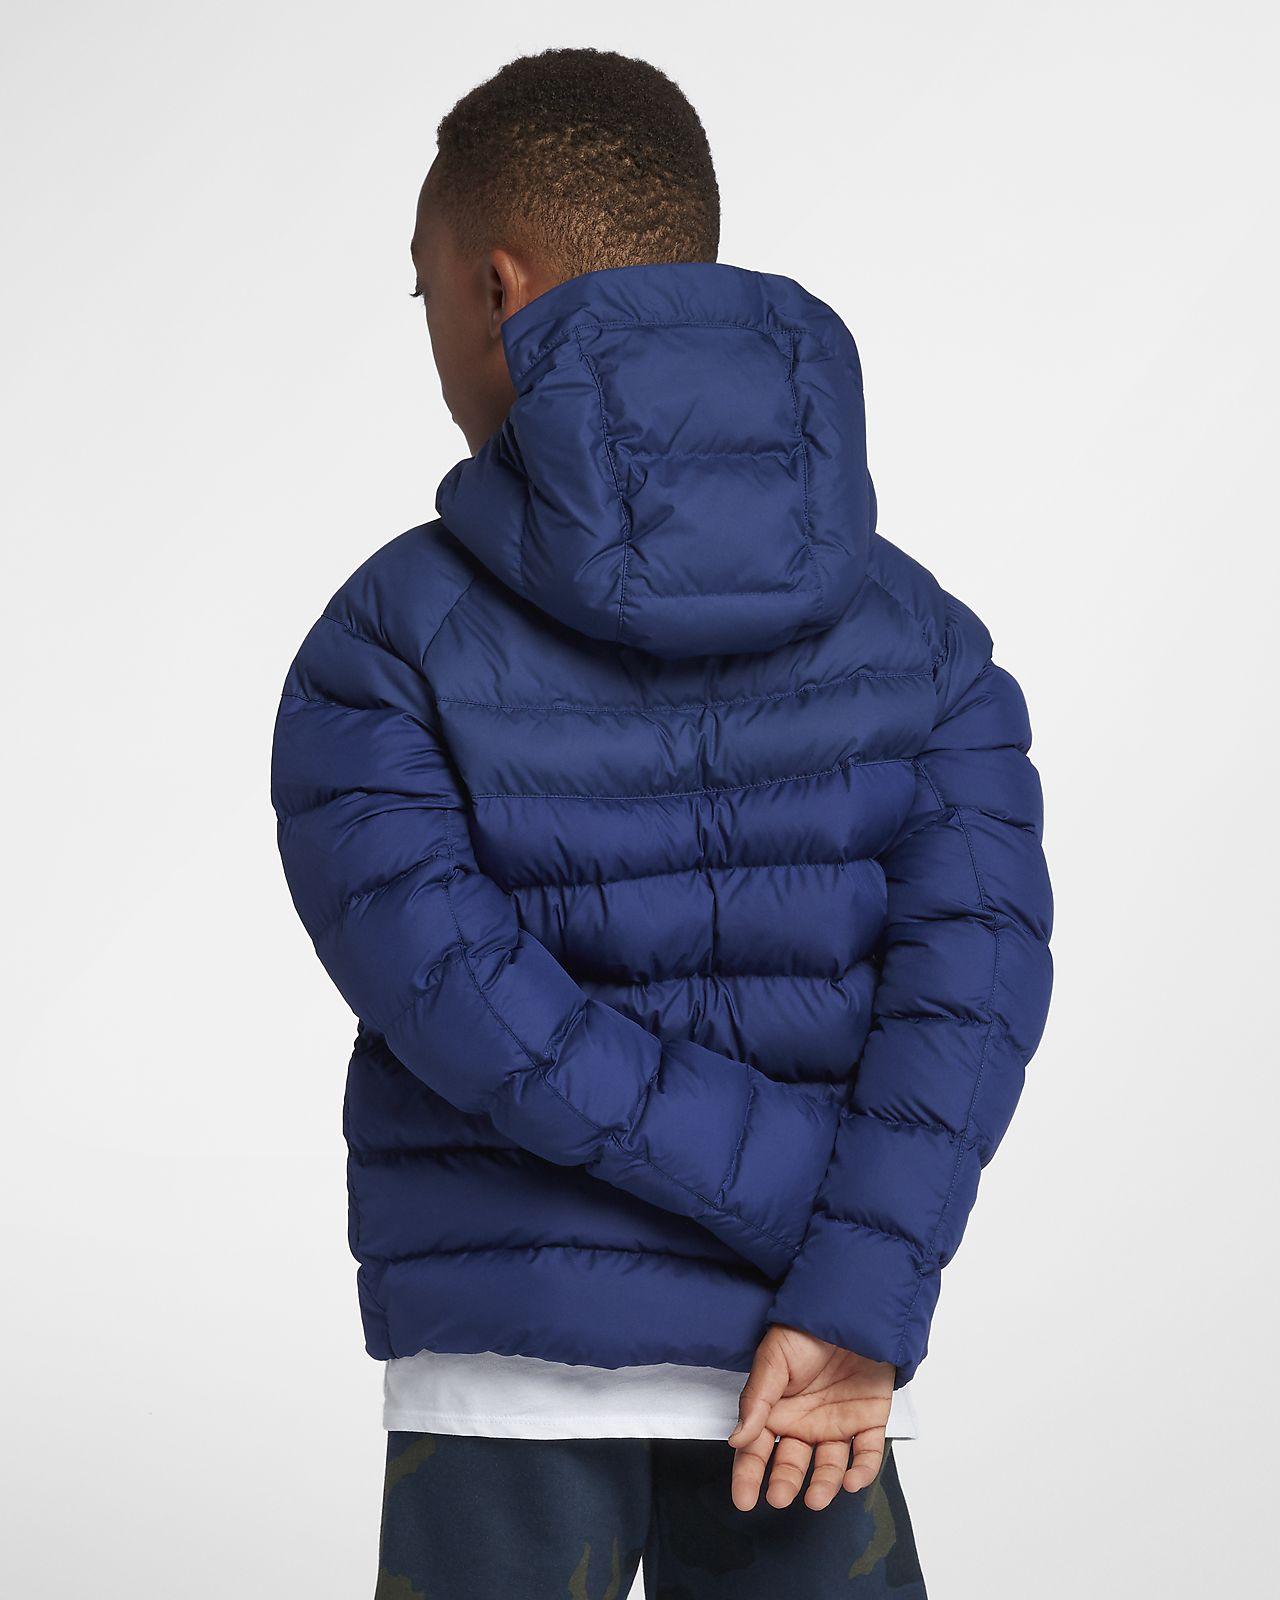 da666a25ffcd Nike Sportswear Big Kids  Synthetic Fill Jacket. Nike.com